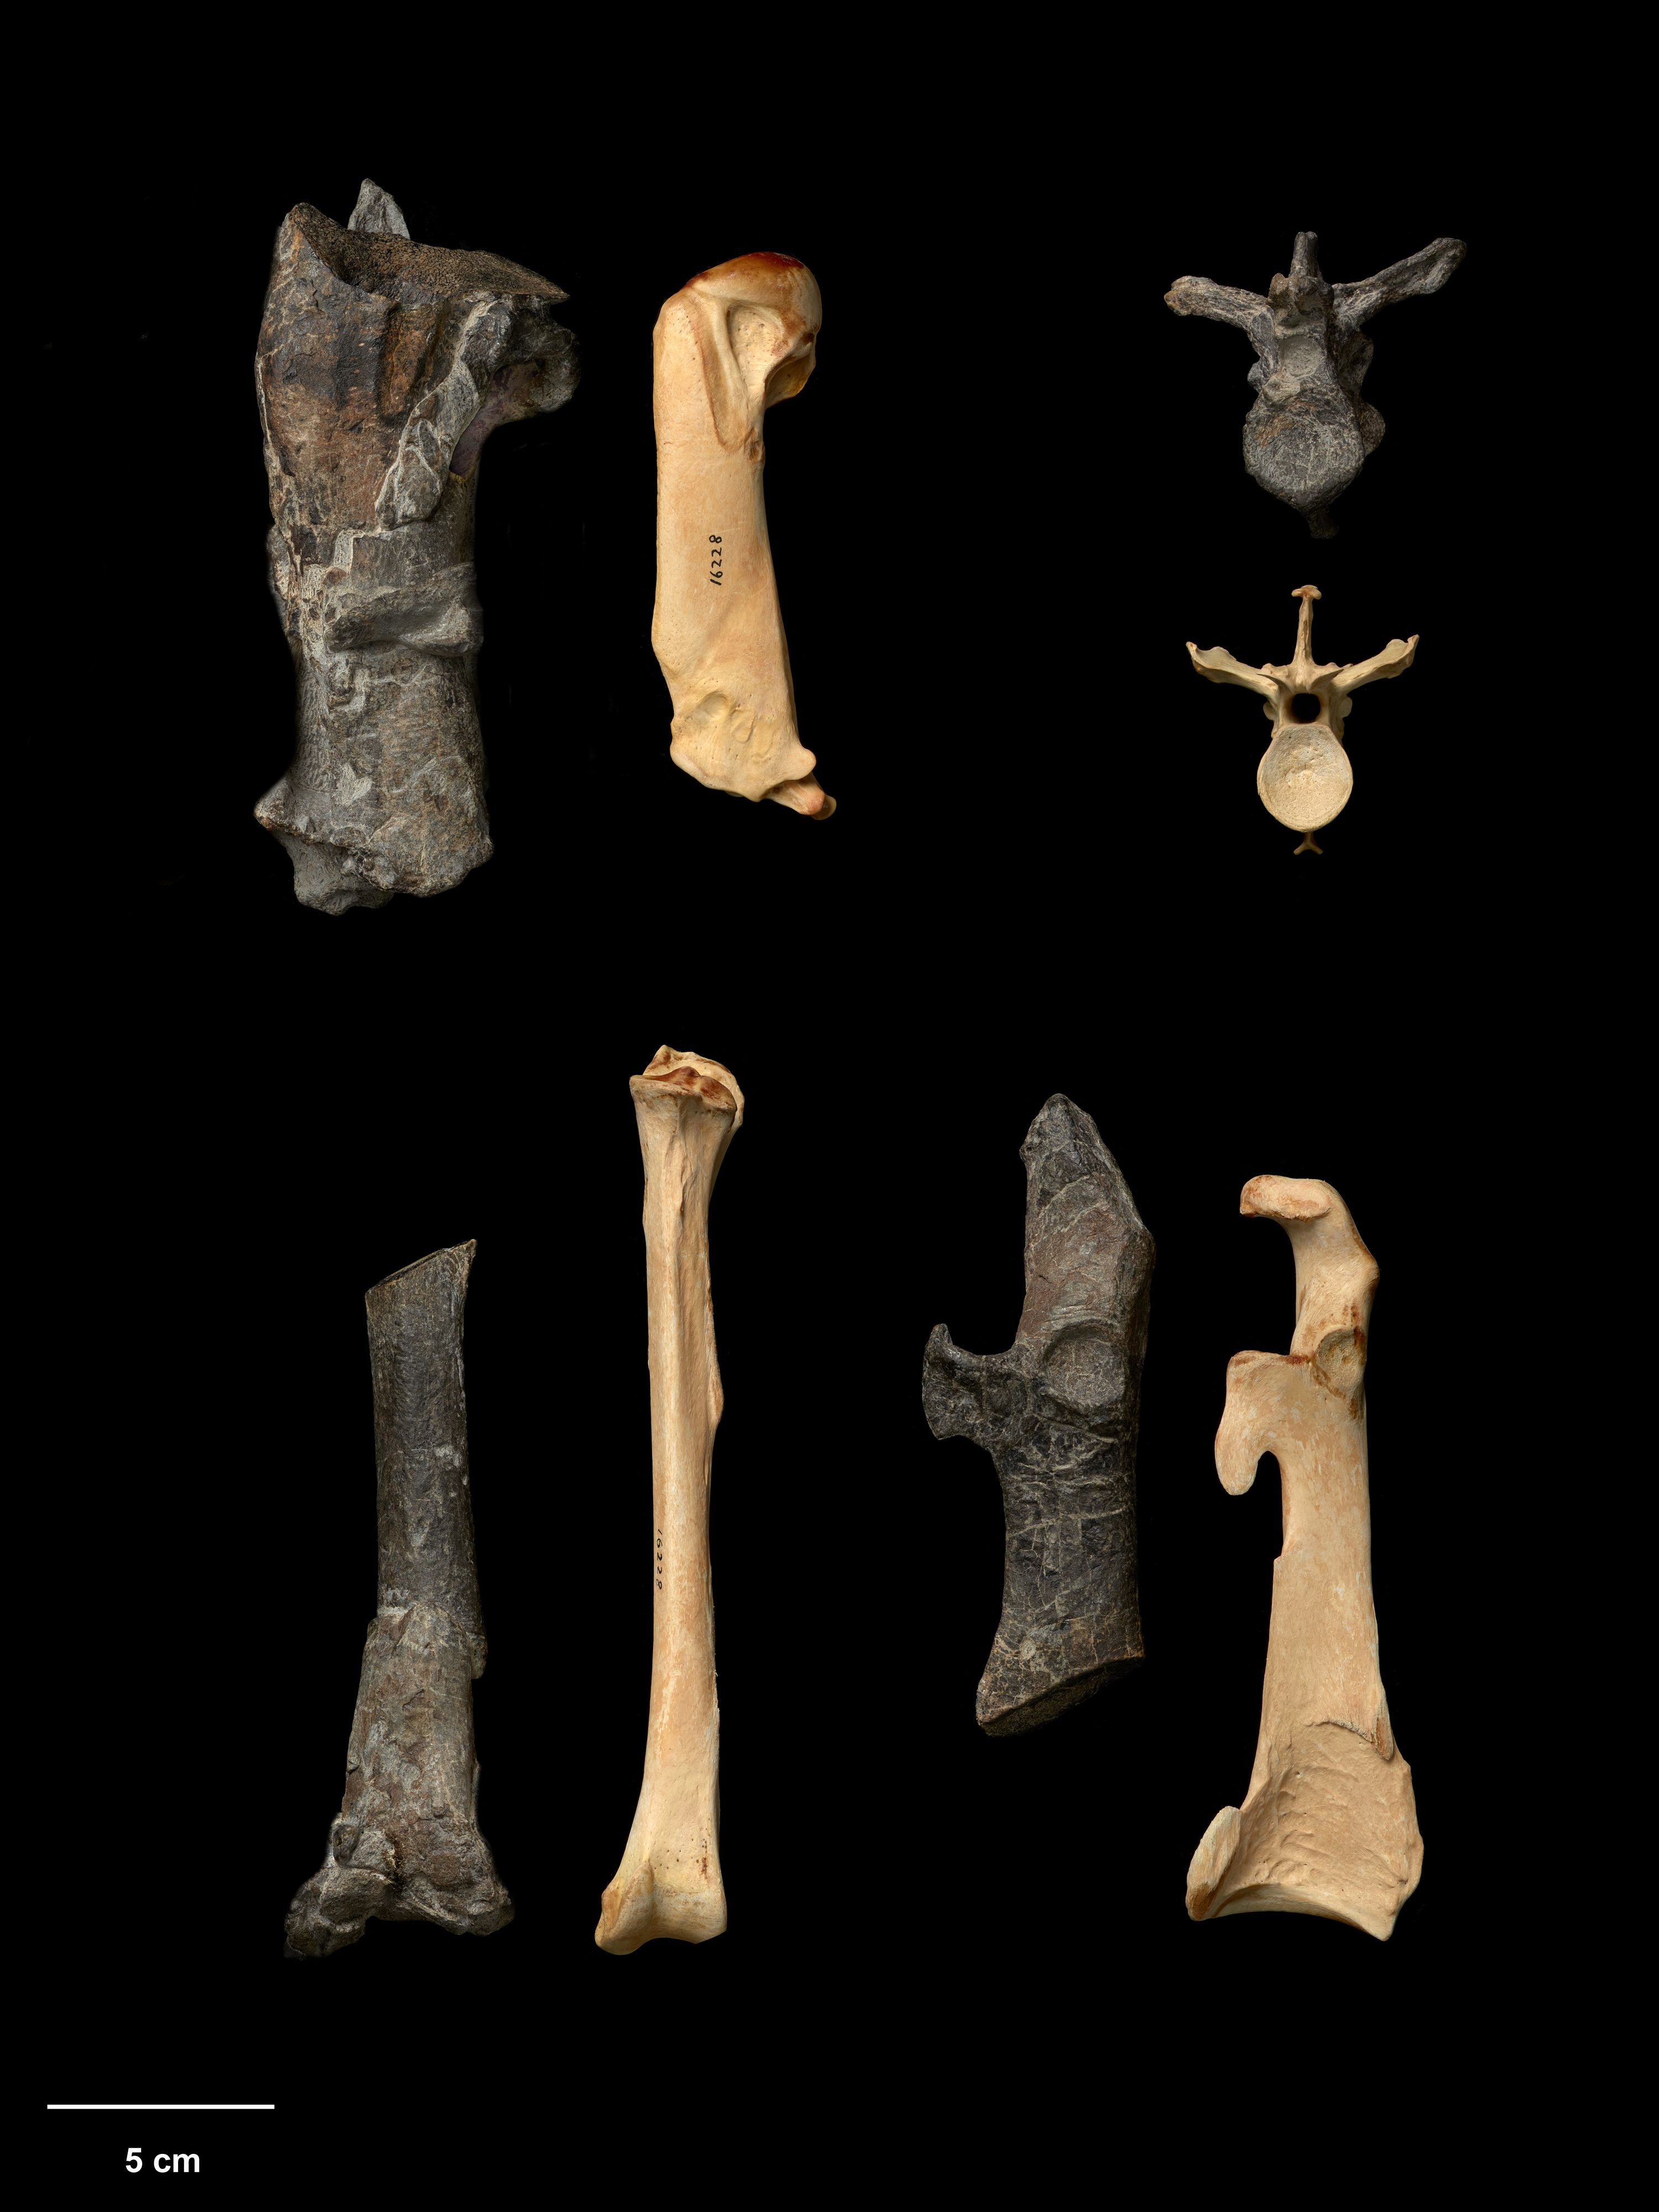 An array of bones